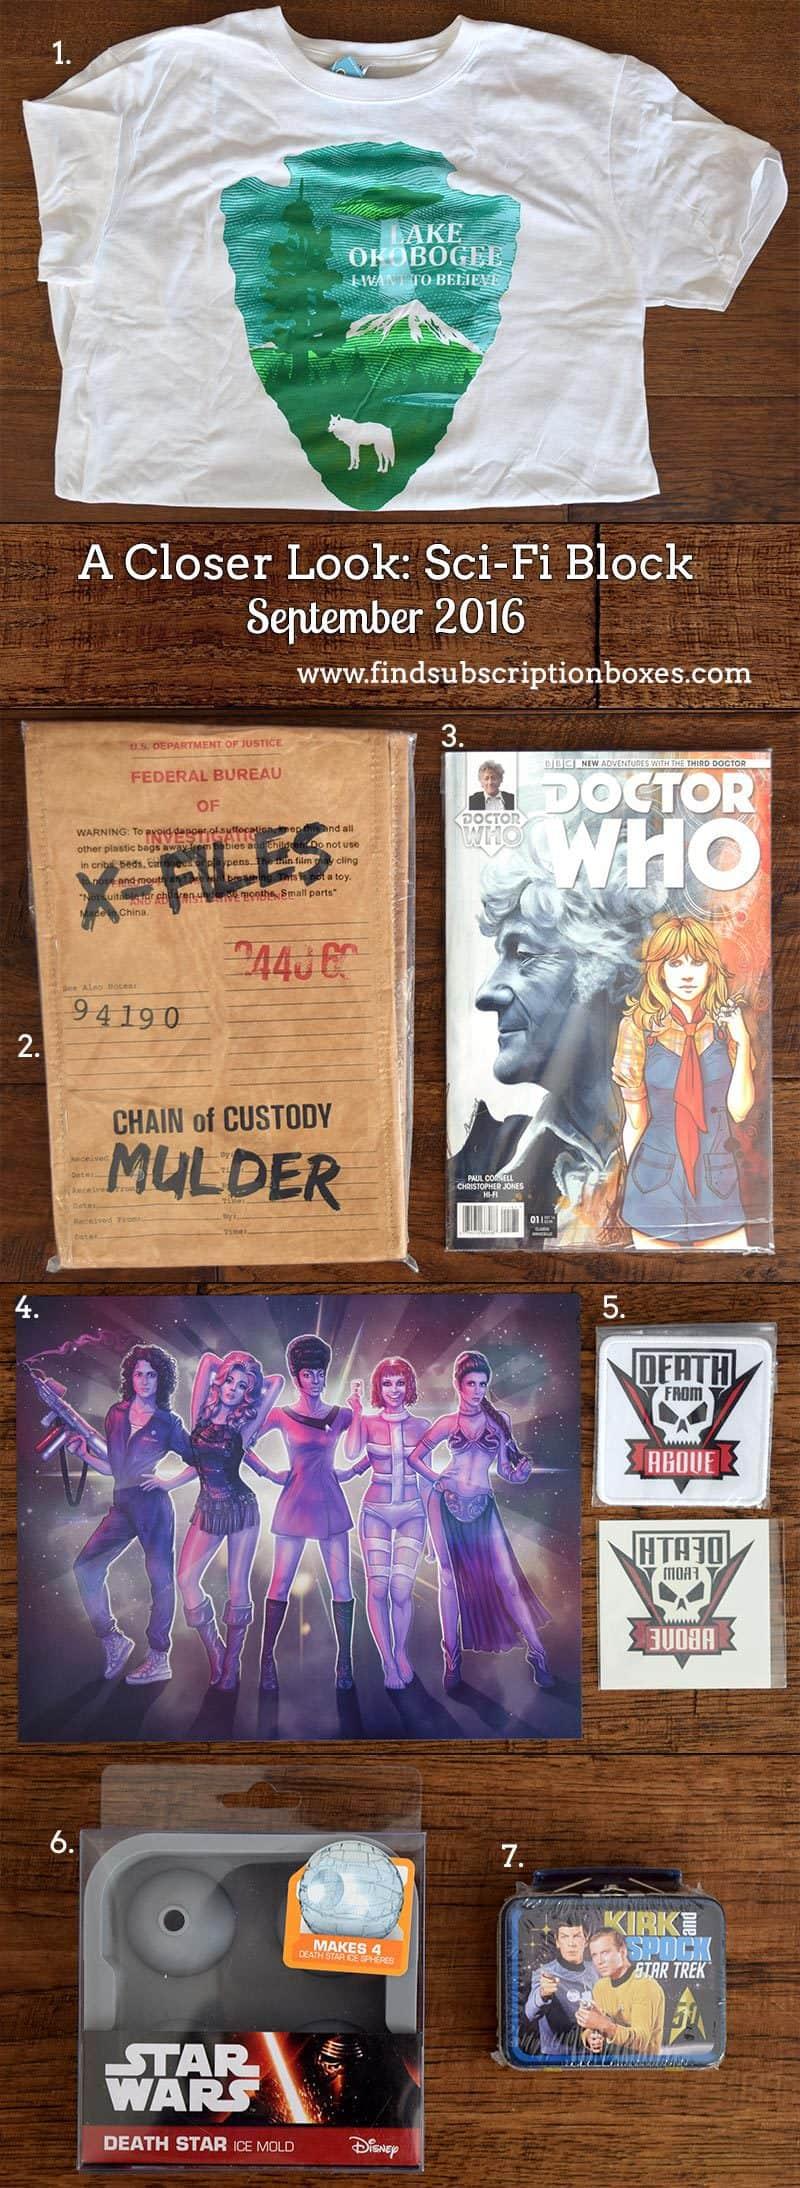 Sci-Fi Block September 2016 Review - Inside the Box